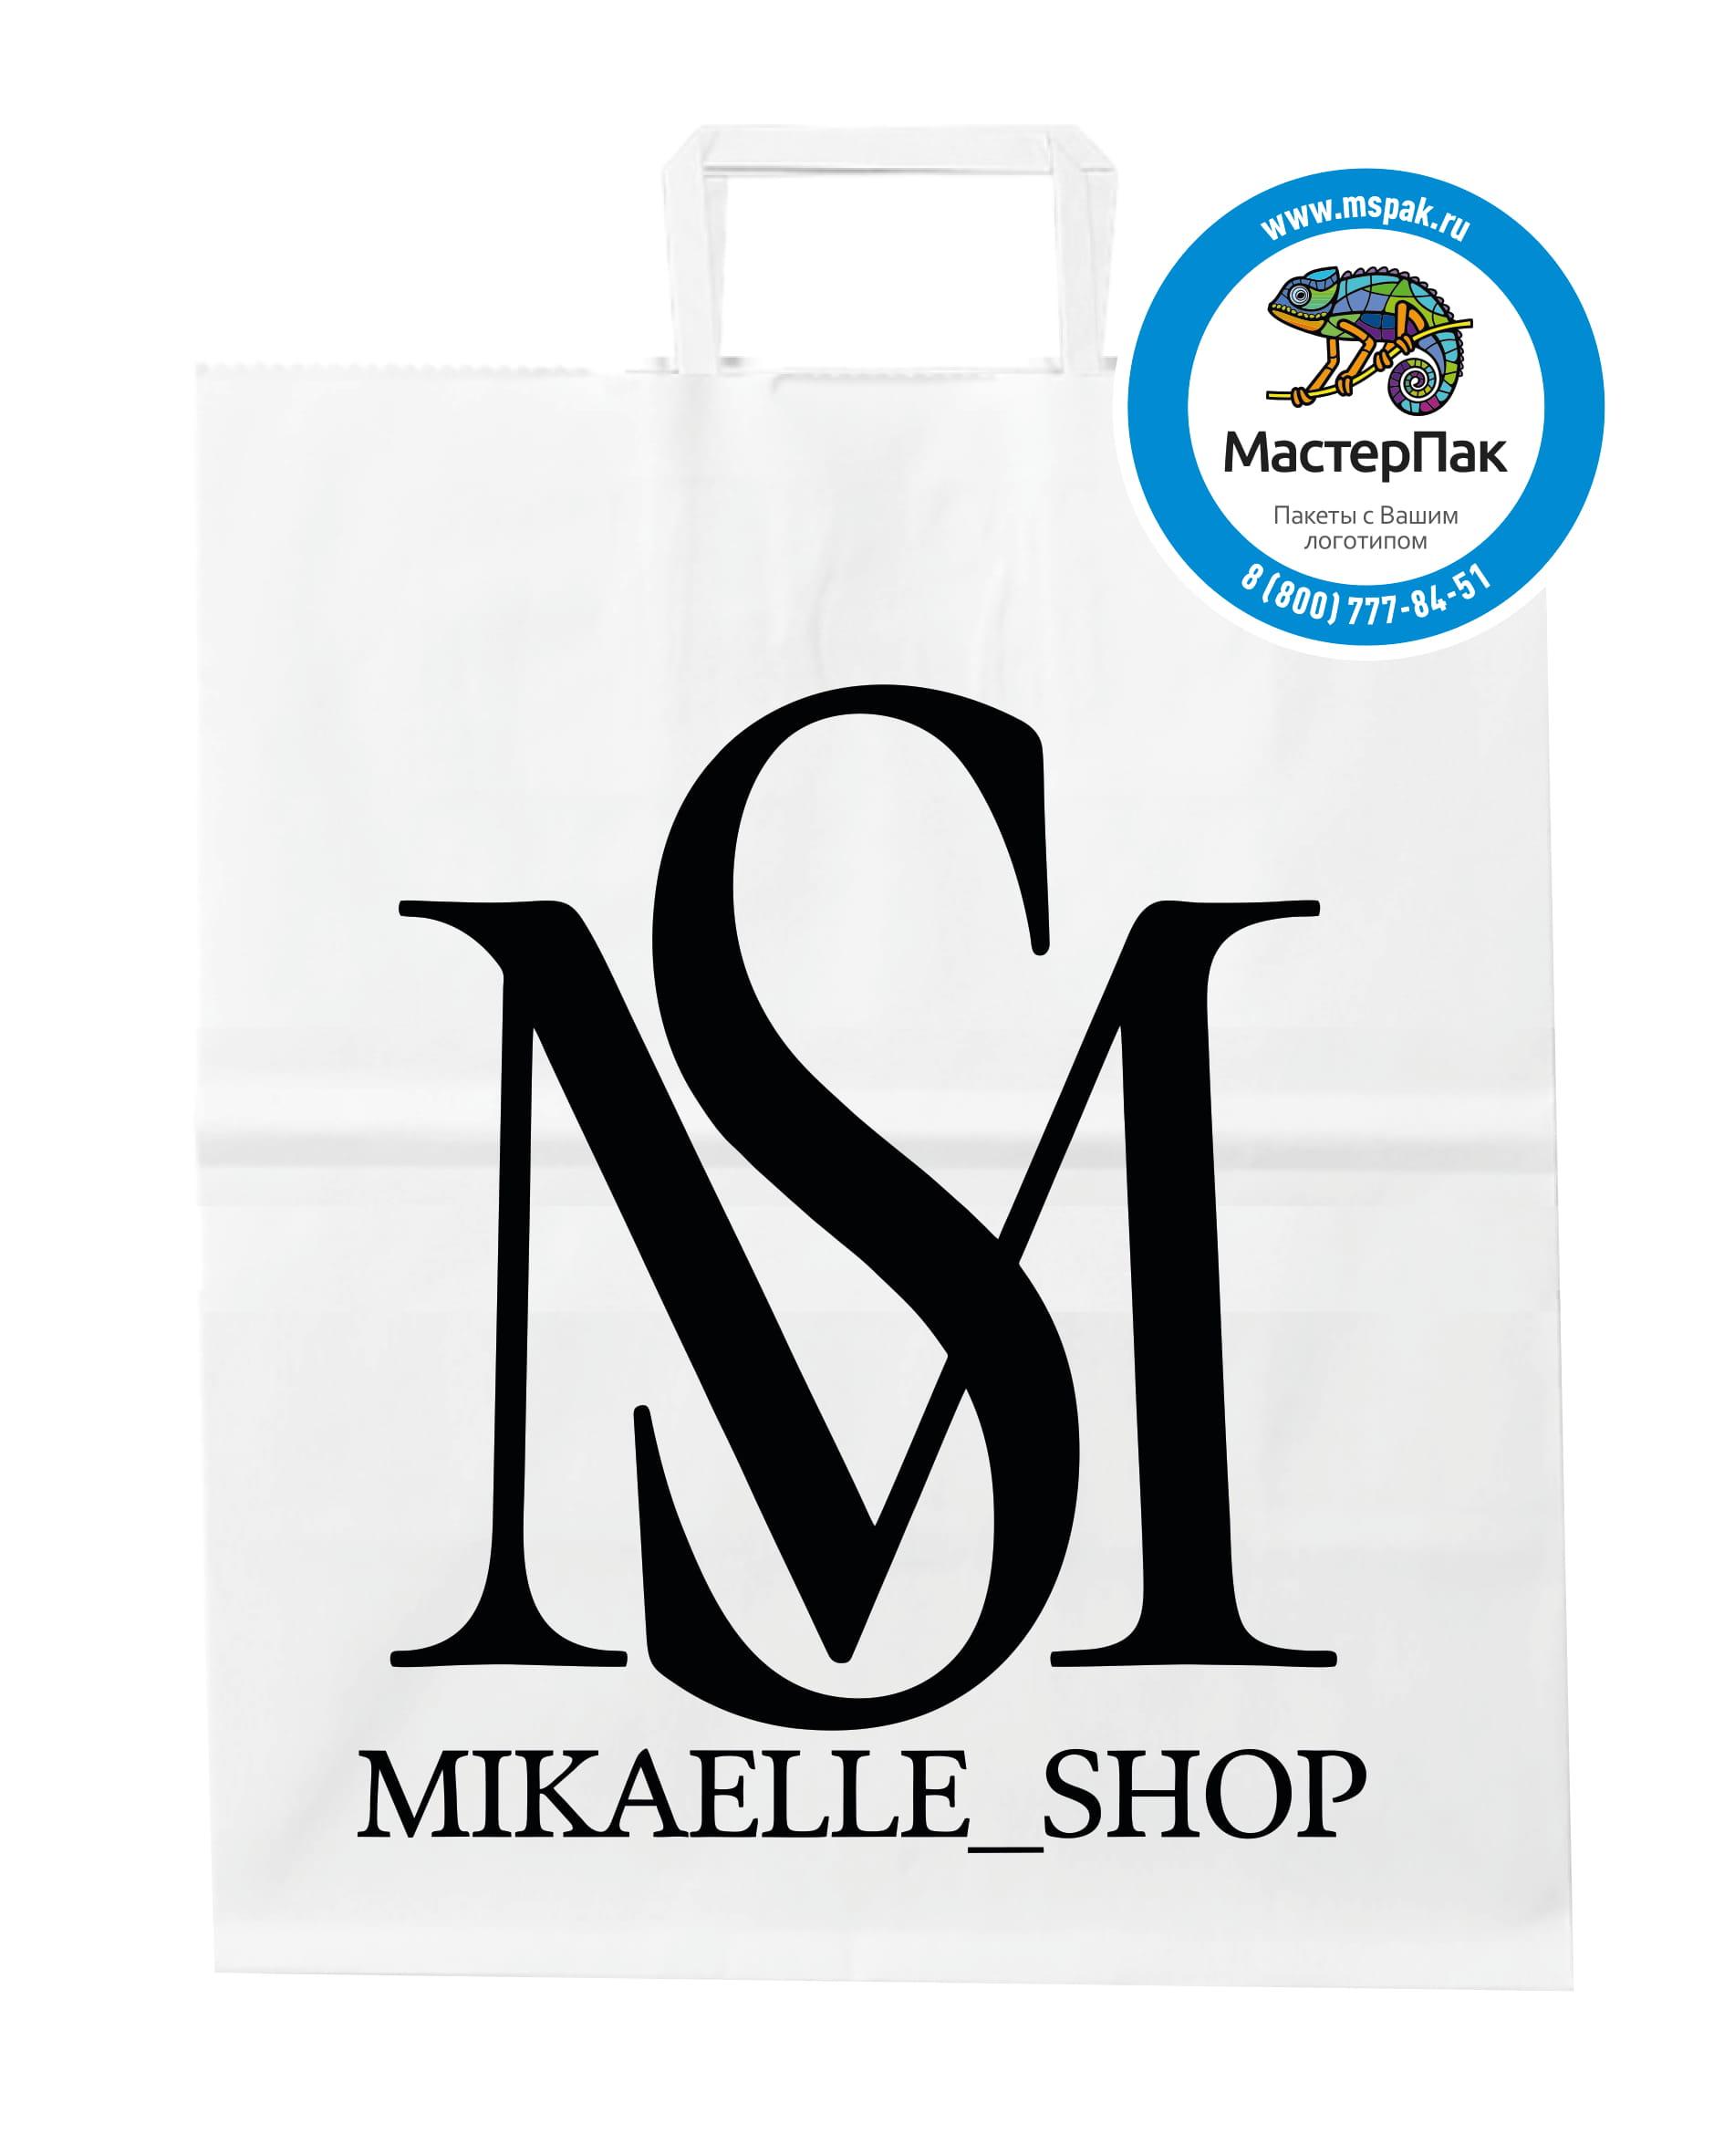 Пакет крафт, бумажный с логотипом магазина Mikaelle_Shop, Мурманская область